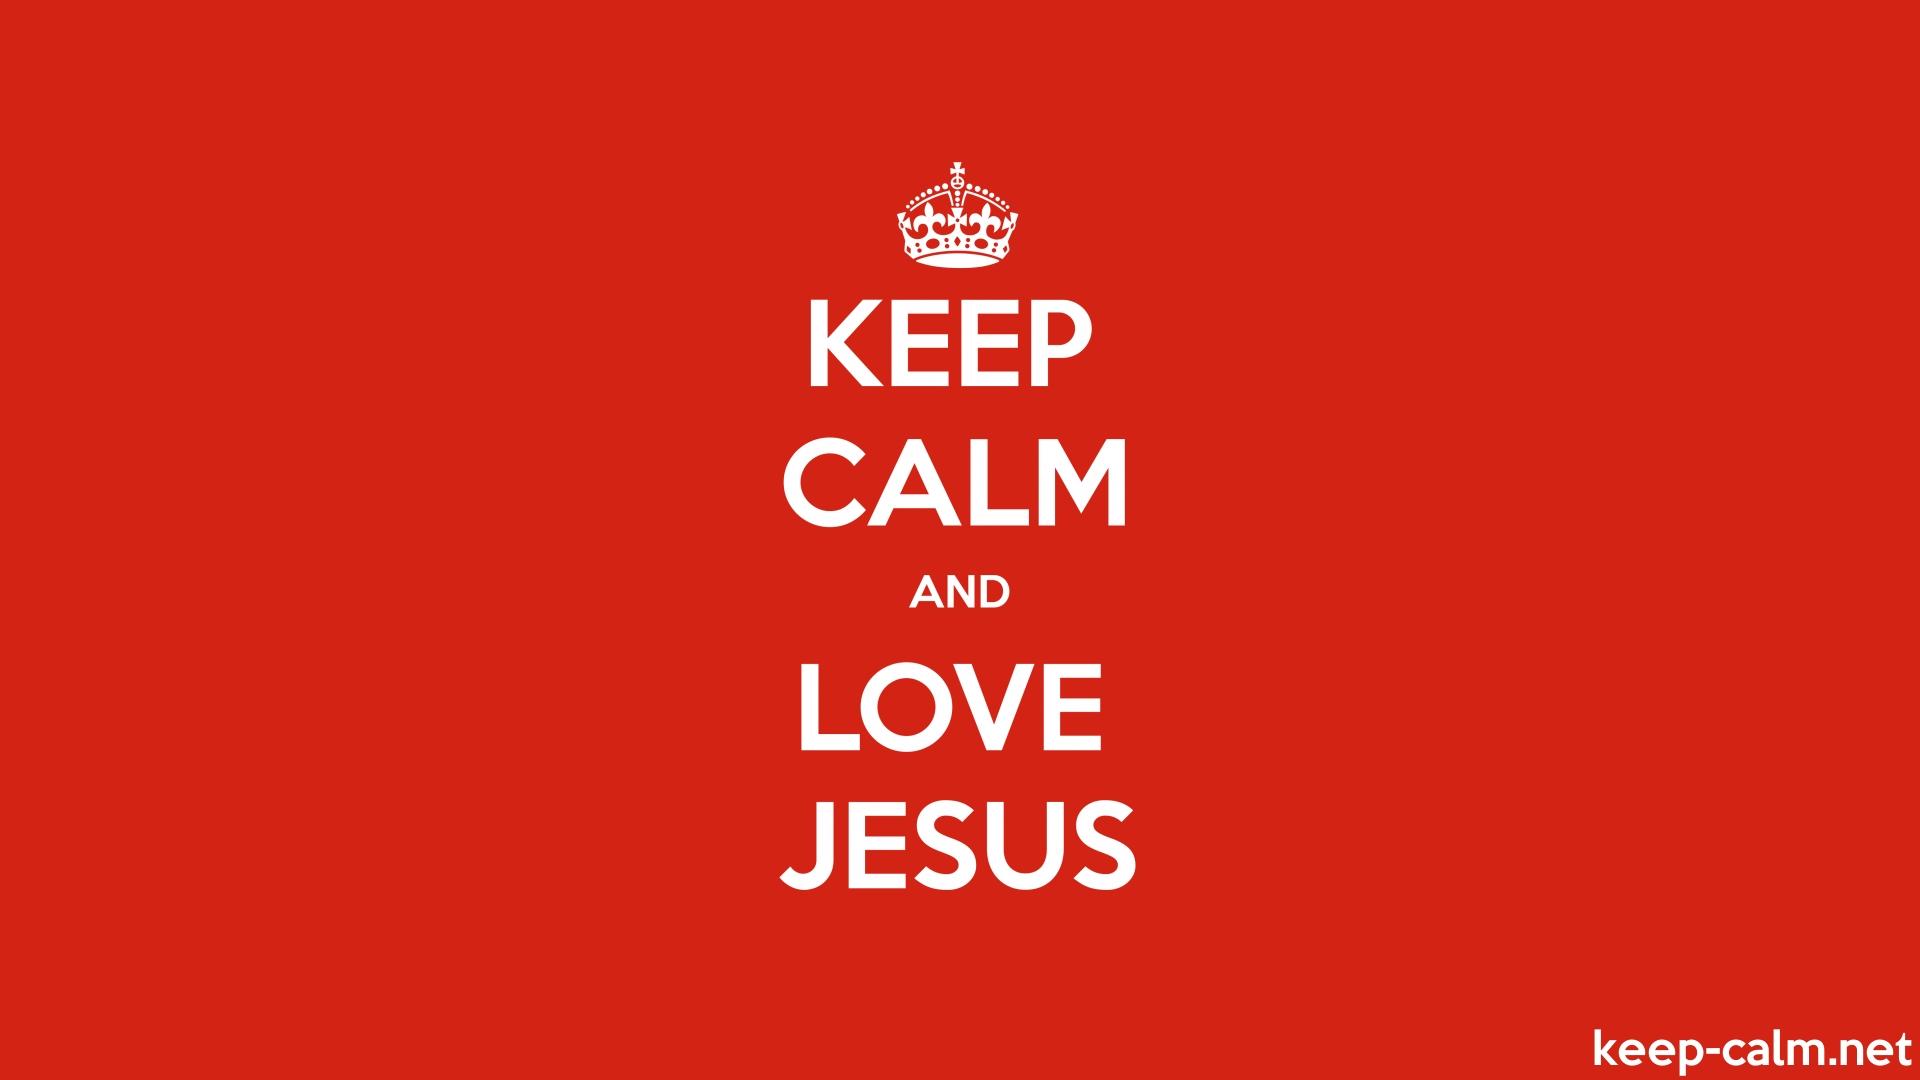 KEEP CALM AND LOVE JESUS   KEEP-CALM net